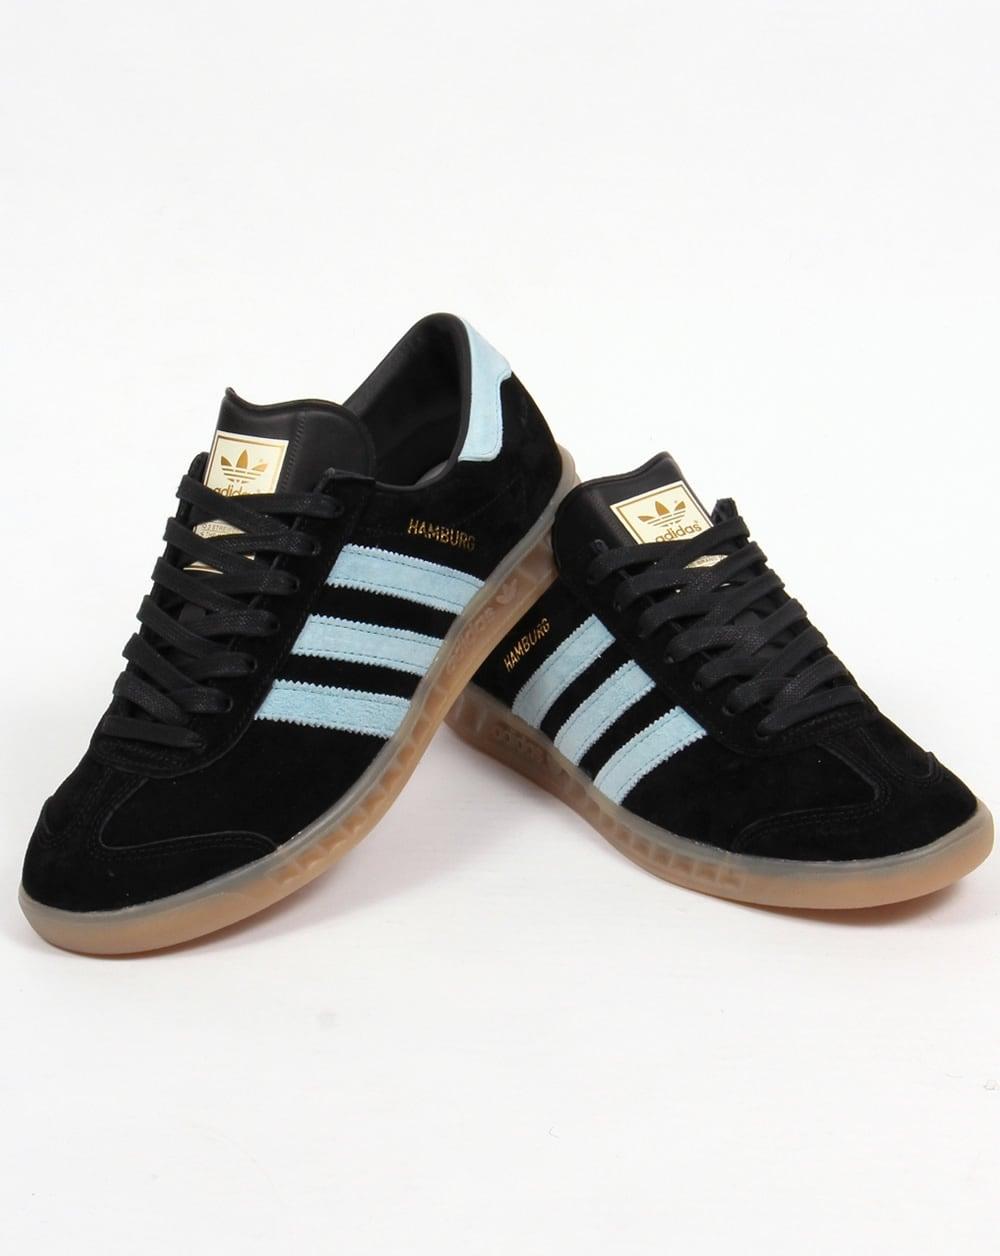 Adidas Hamburg Trainers Black/Blush Blue,originals,shoes ...